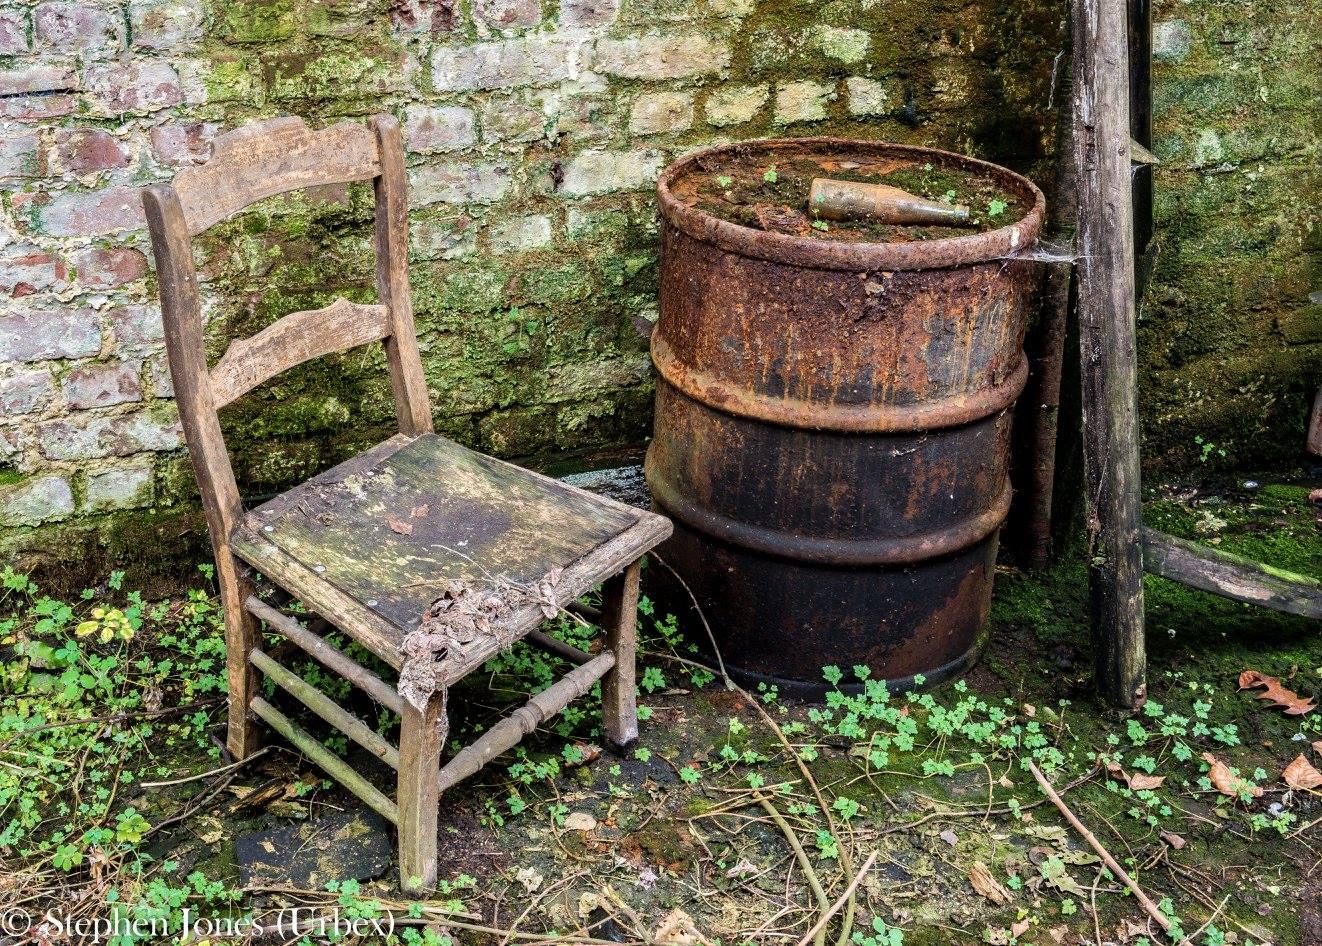 Urbex Belgium chair and barrel